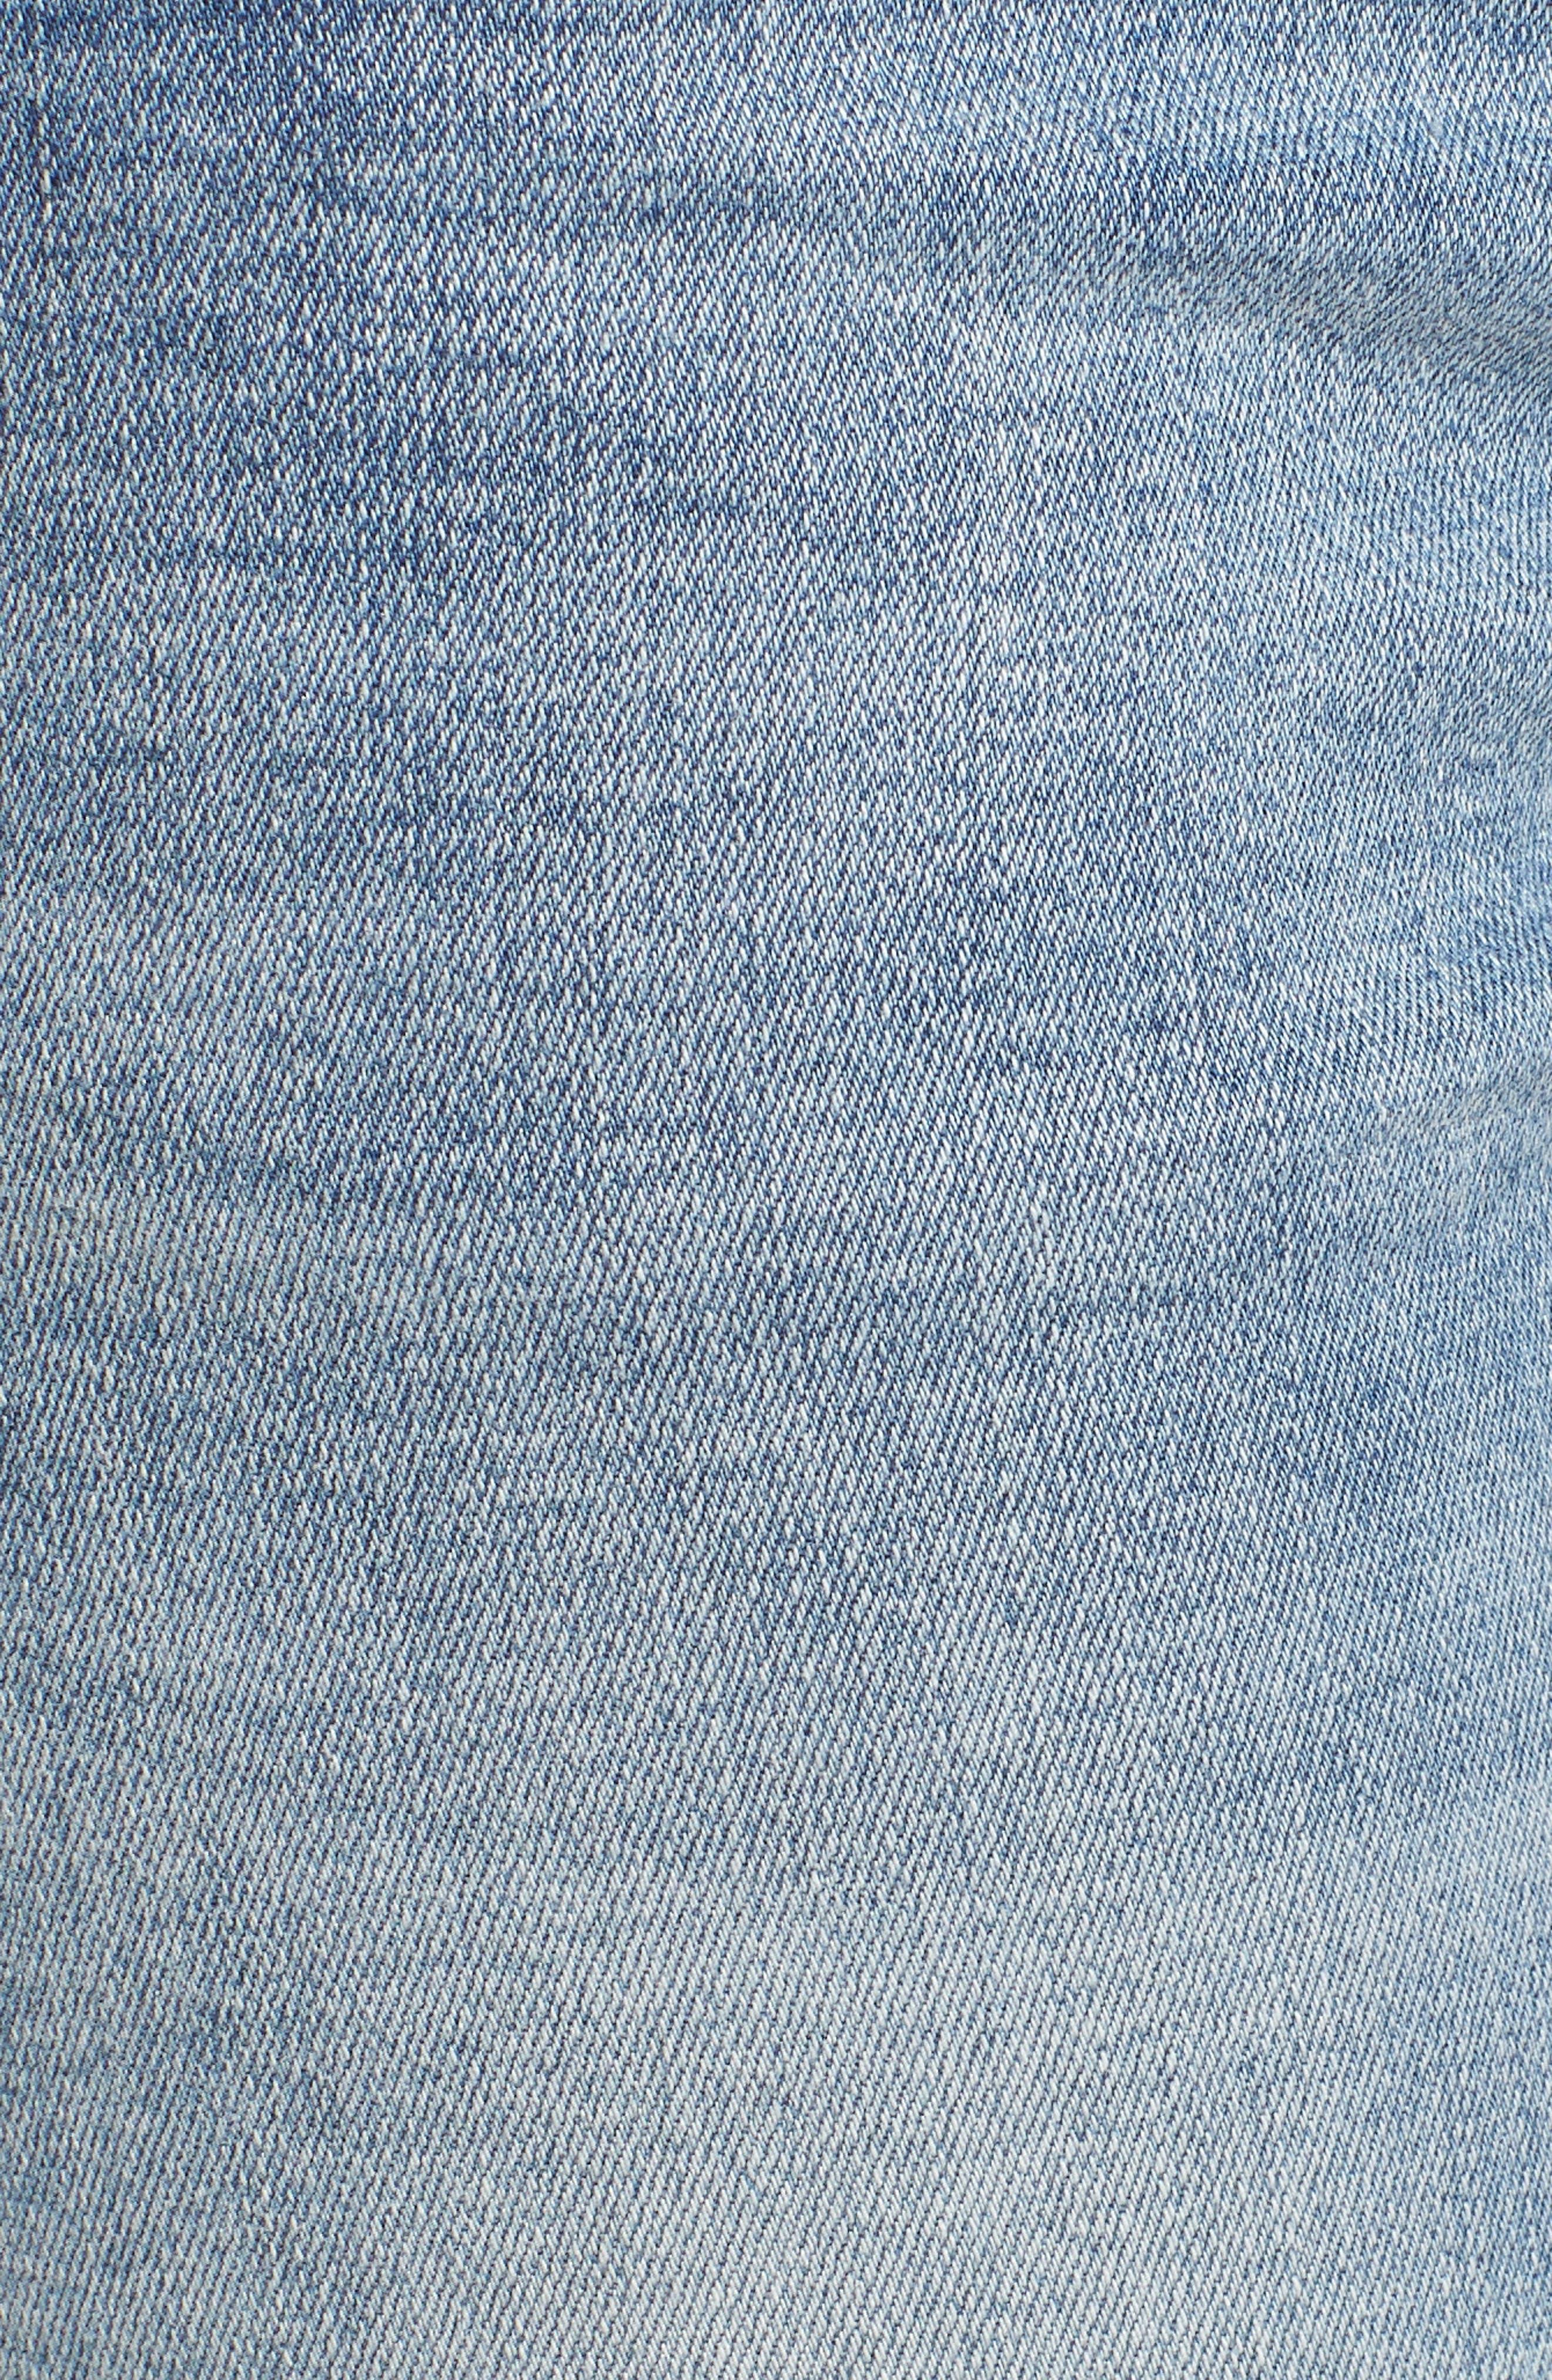 Freebirds Skinny Jeans,                             Alternate thumbnail 6, color,